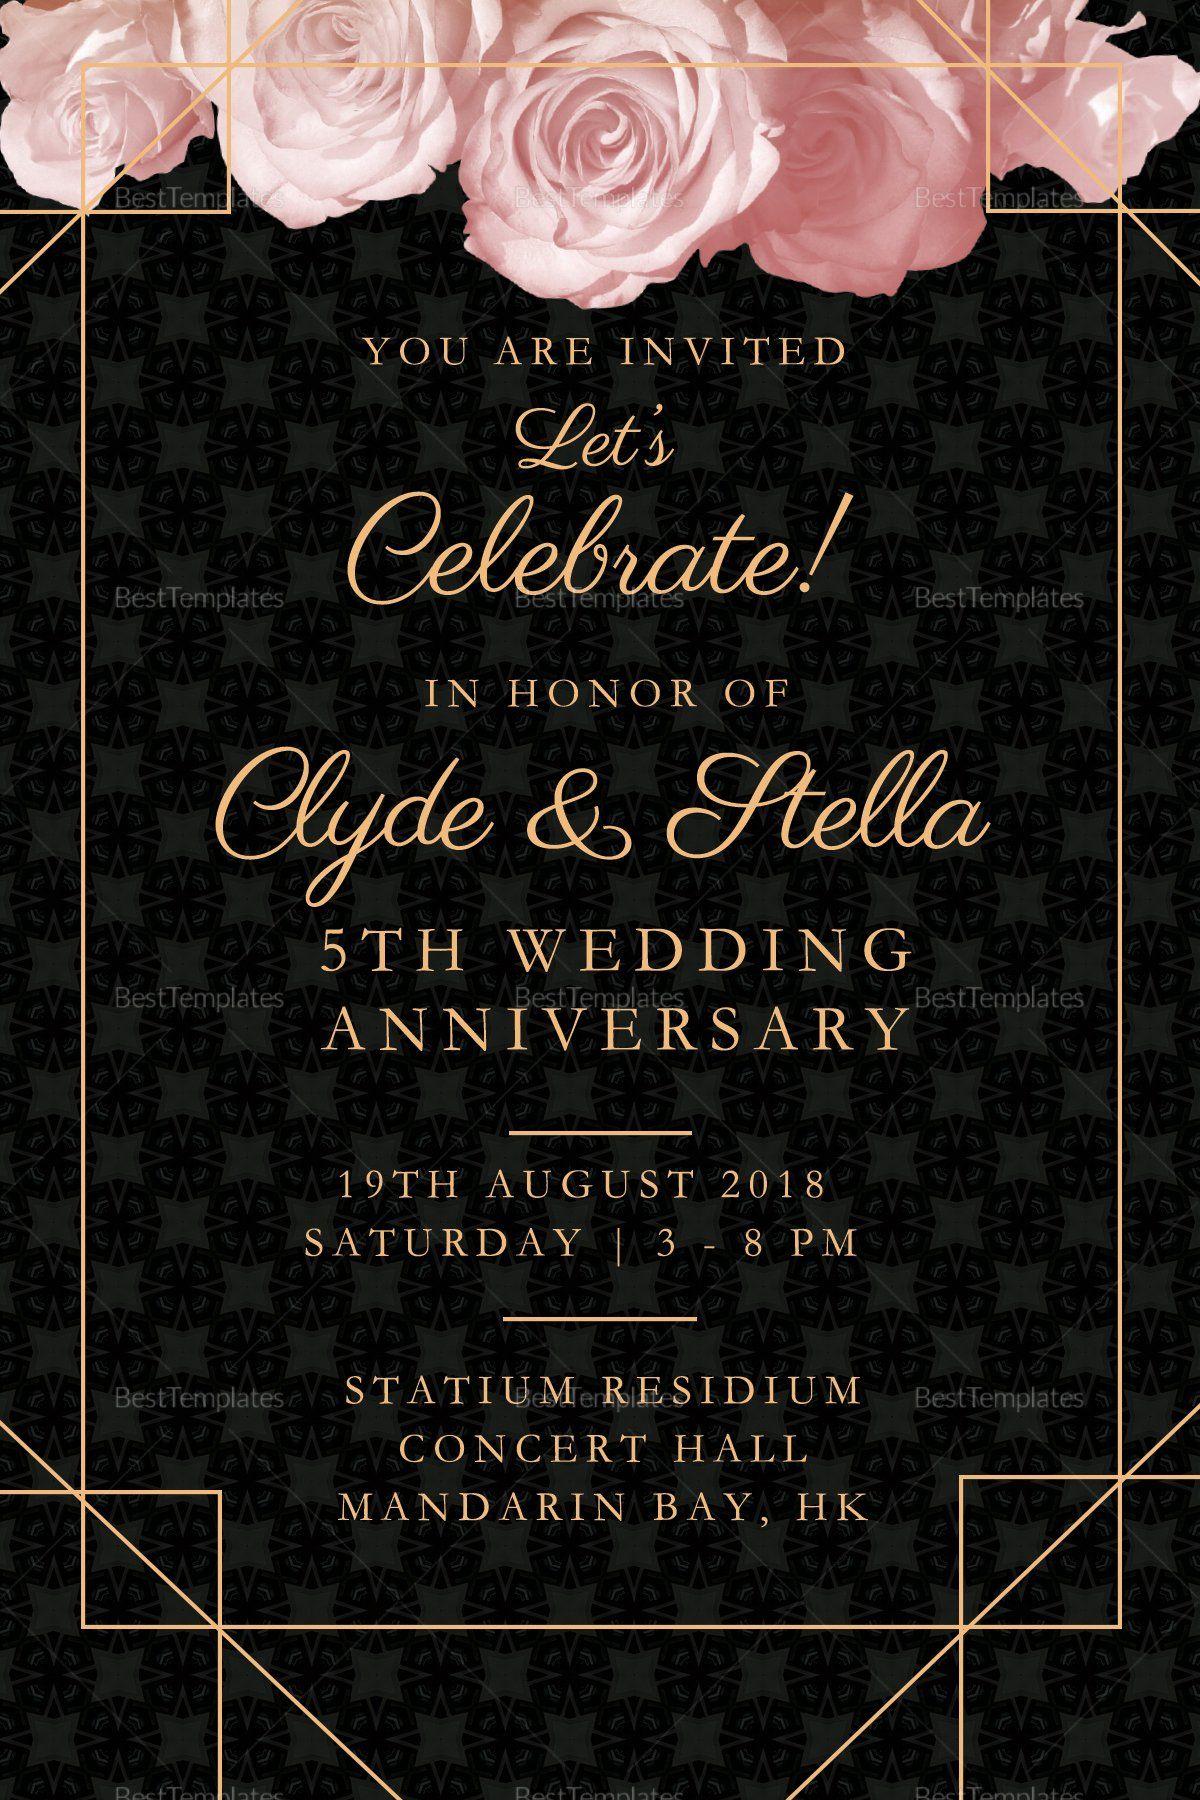 Wedding Anniversary Invitation Template Awesome Elegant Wedding Wedding Anniversary Invitations Modern Wedding Invitation Wording Wedding Invitation Templates